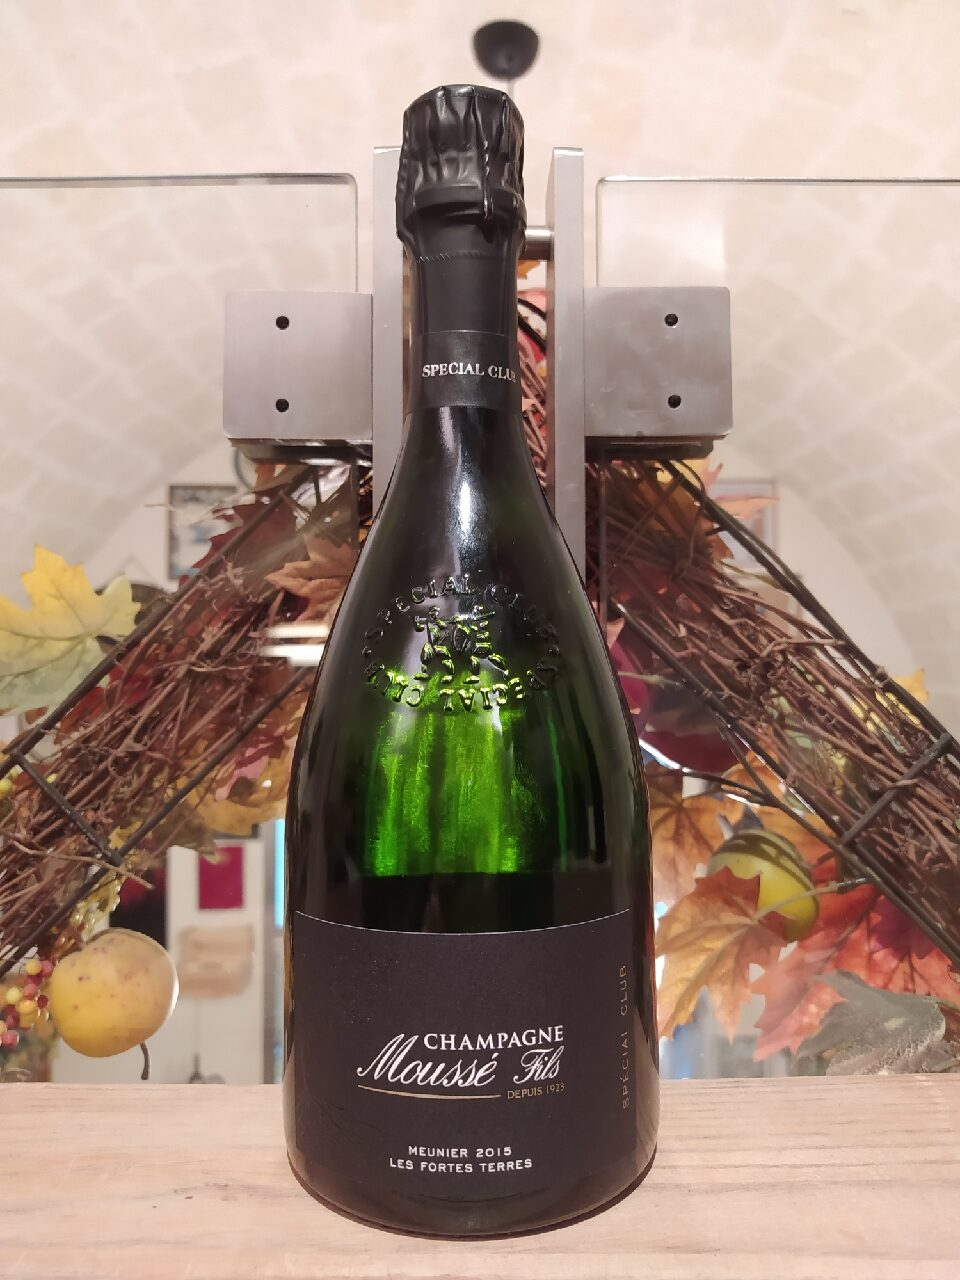 Les Fortes Terres Moussé Fils Champagne Extra Brut Special Club 2015